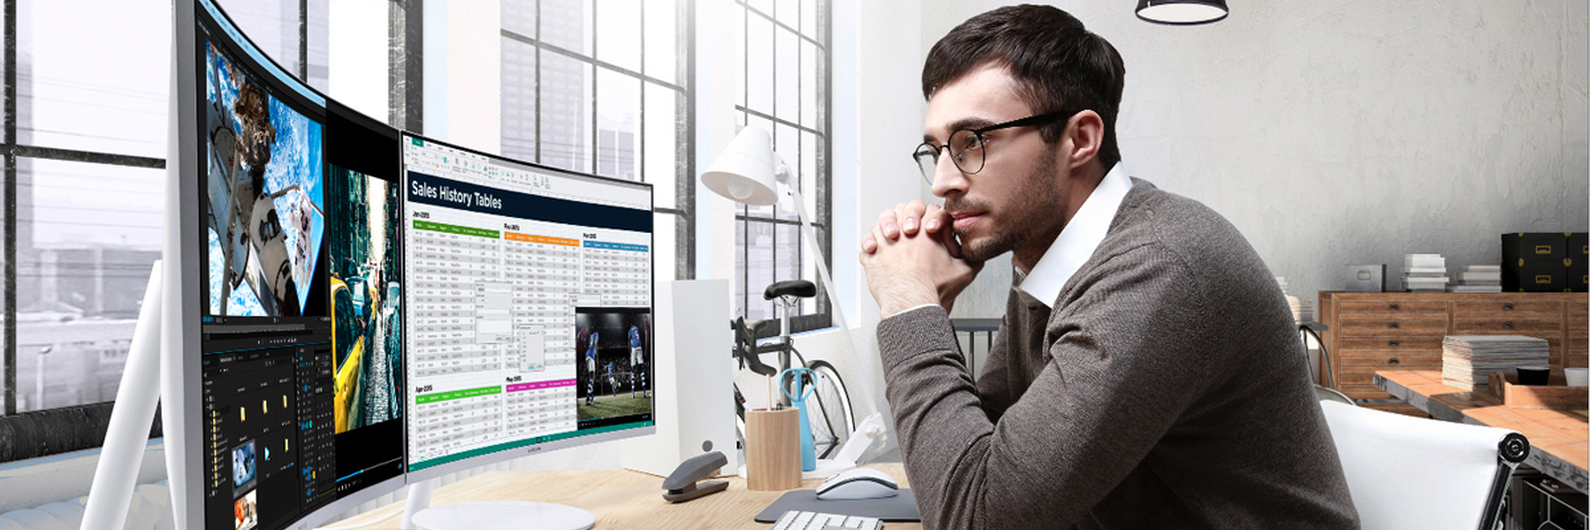 Montra TeK: 5 monitores curvos prontos para os seus conteúdos Full HD